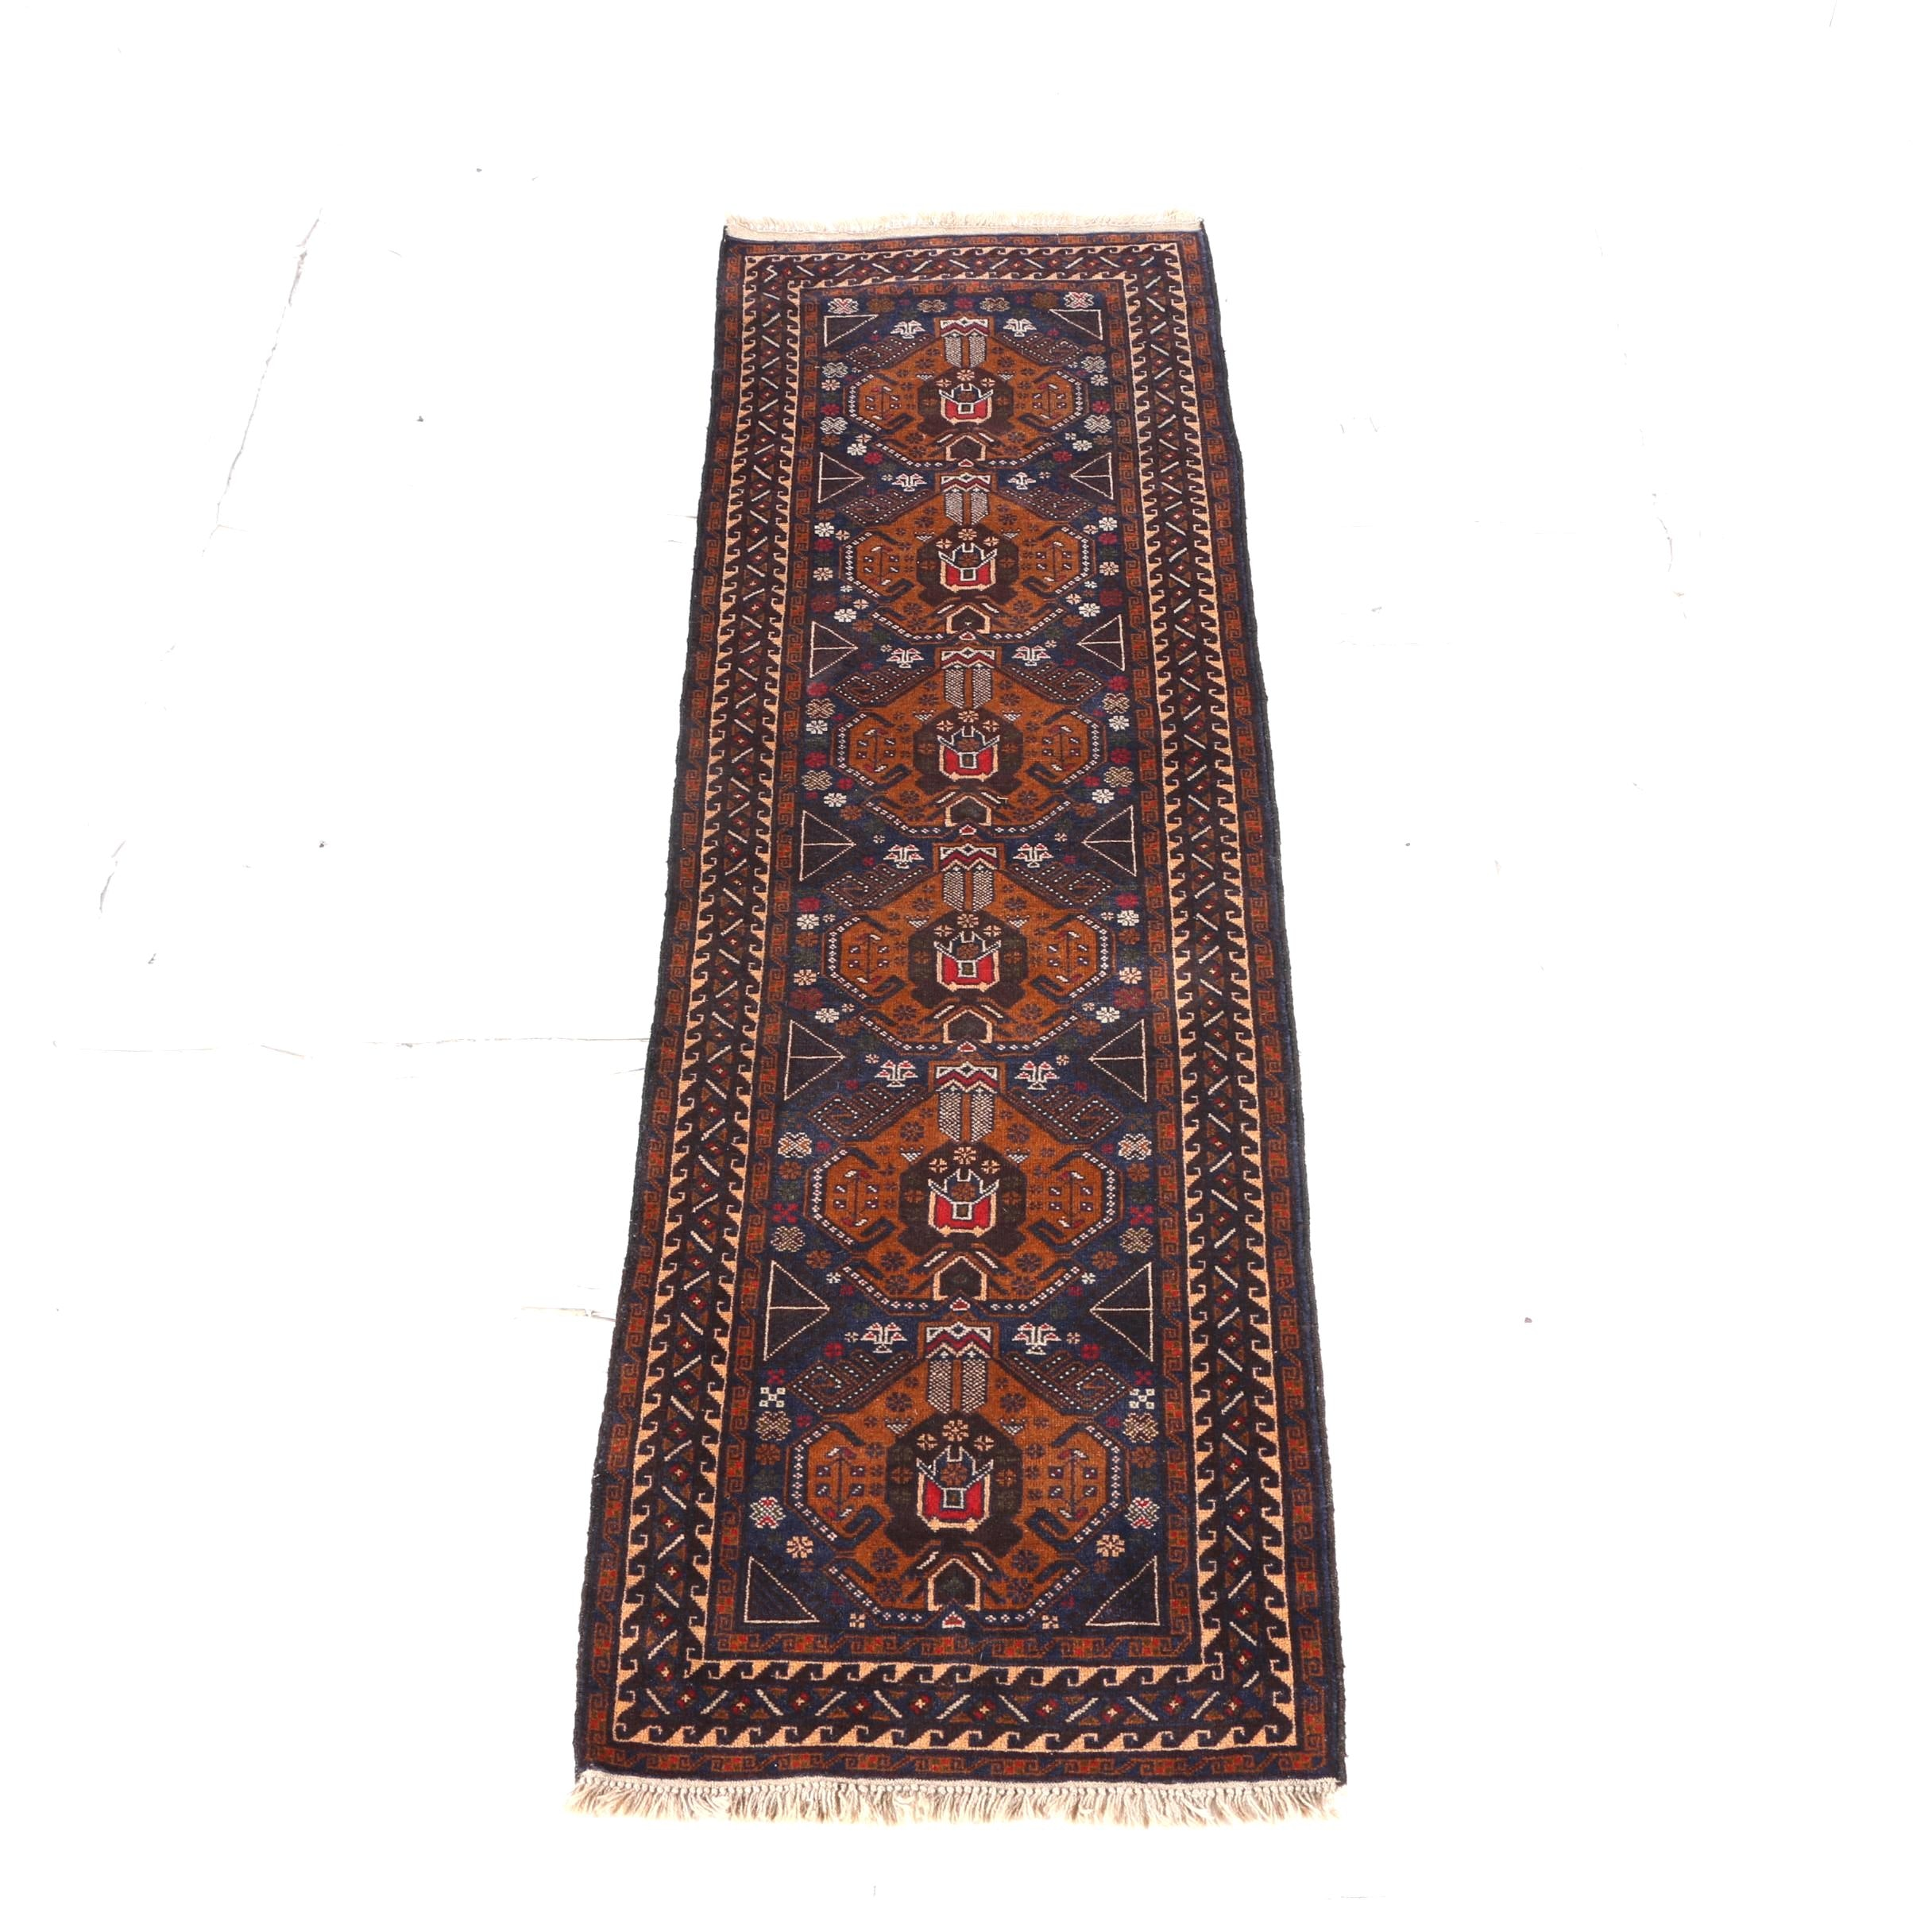 Hand-Knotted Herat Carpet Runner